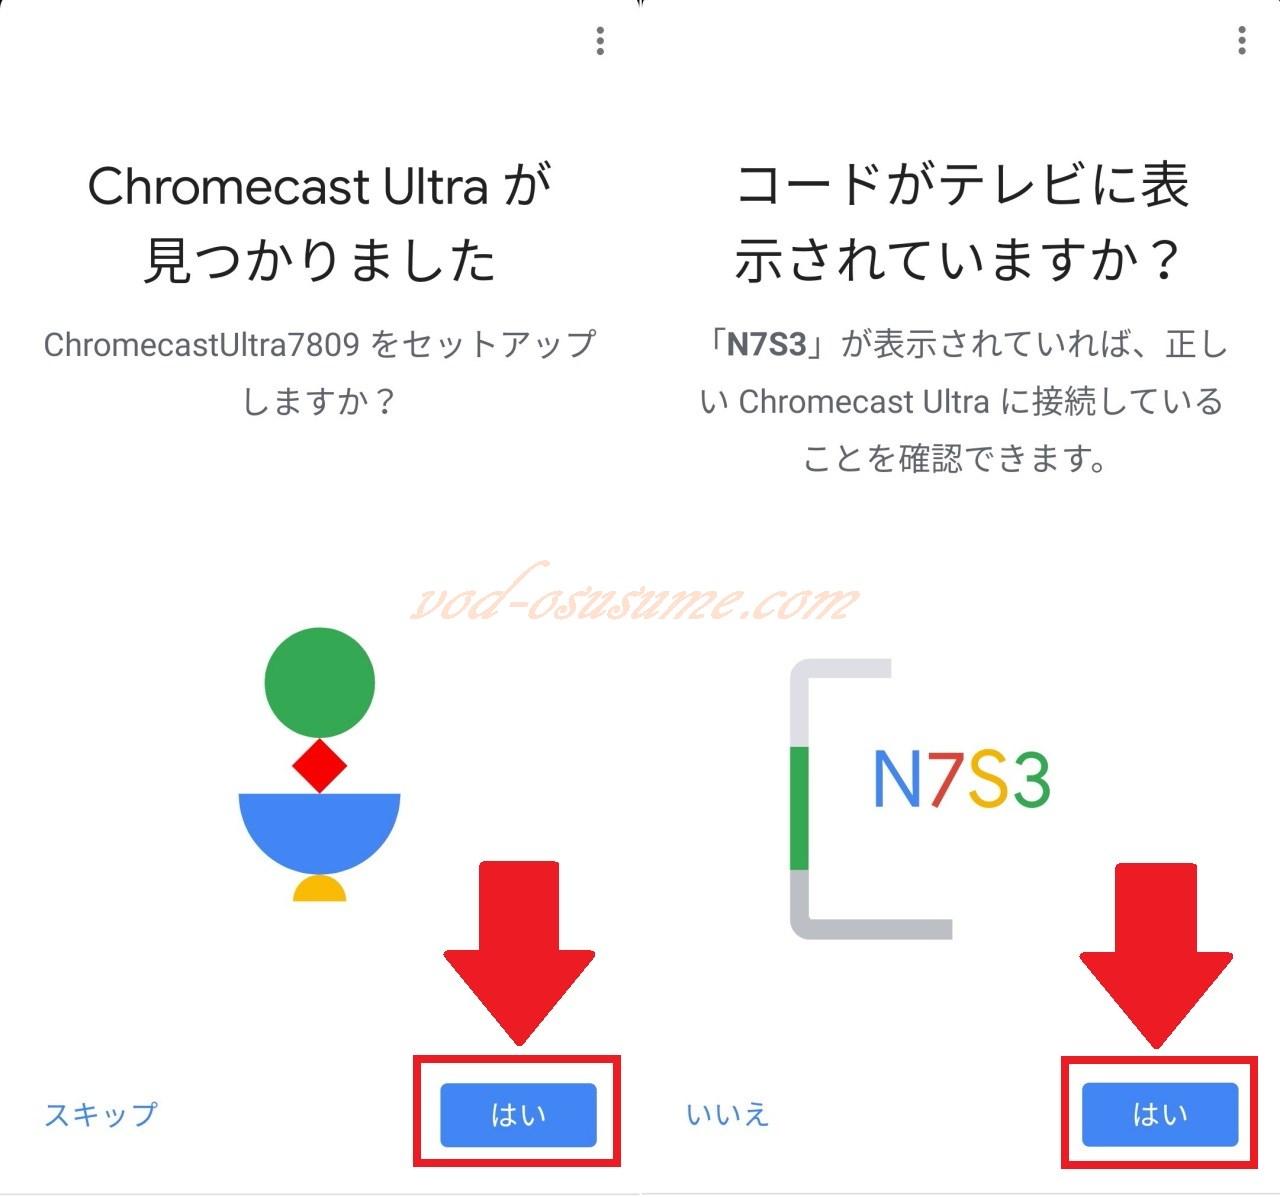 Chromecast Ultra4ケタの英数字を確認して「はい」をタップ